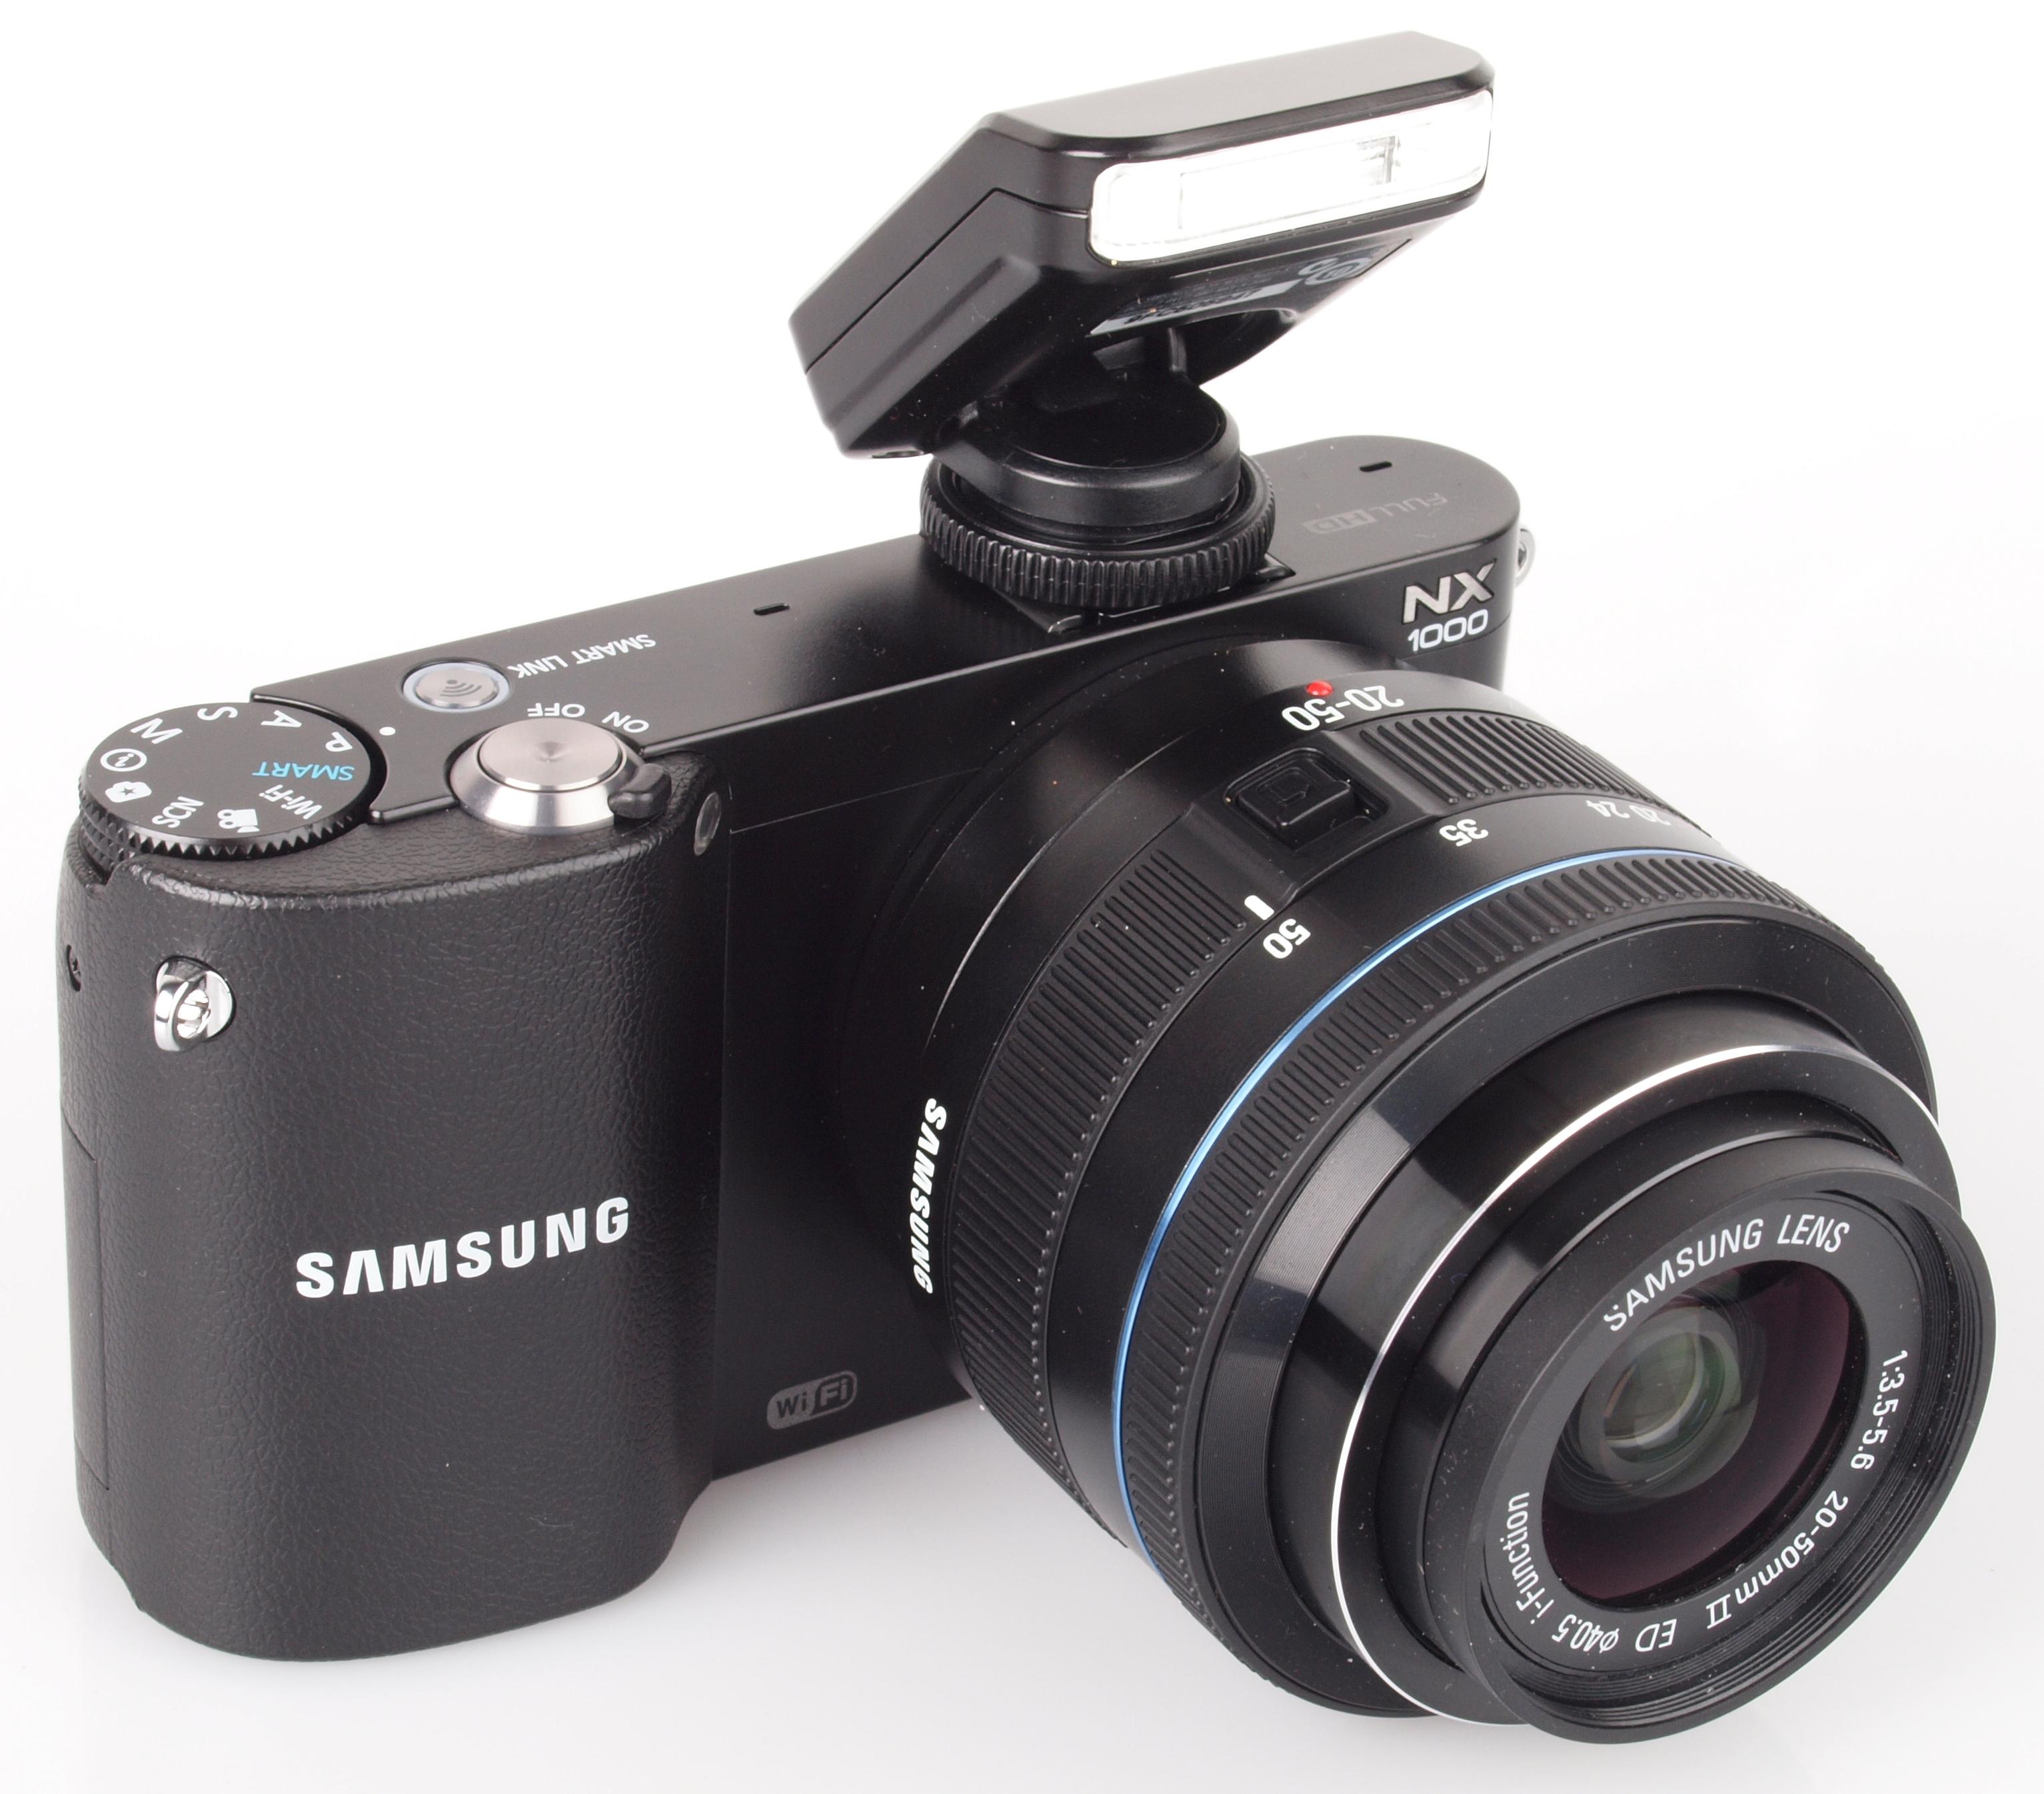 Samsung NX1000 Sample Photo Gallery